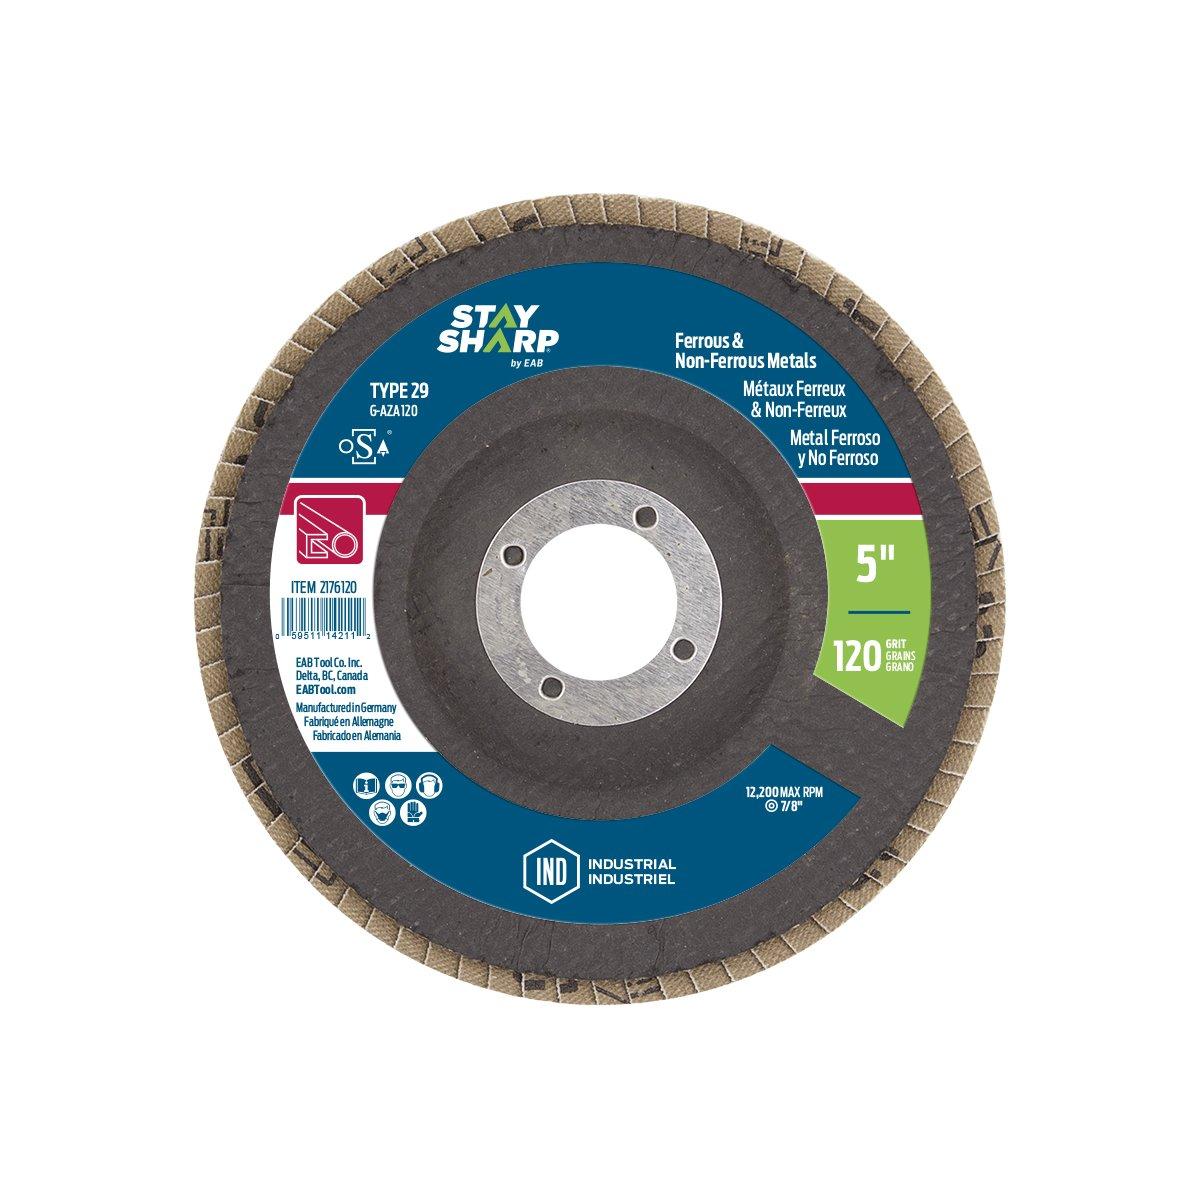 EAB Tool 2176120 5 x 120 Grit Standard Wood /& Metal Flap Disc Type 29 Professional Abrasive,